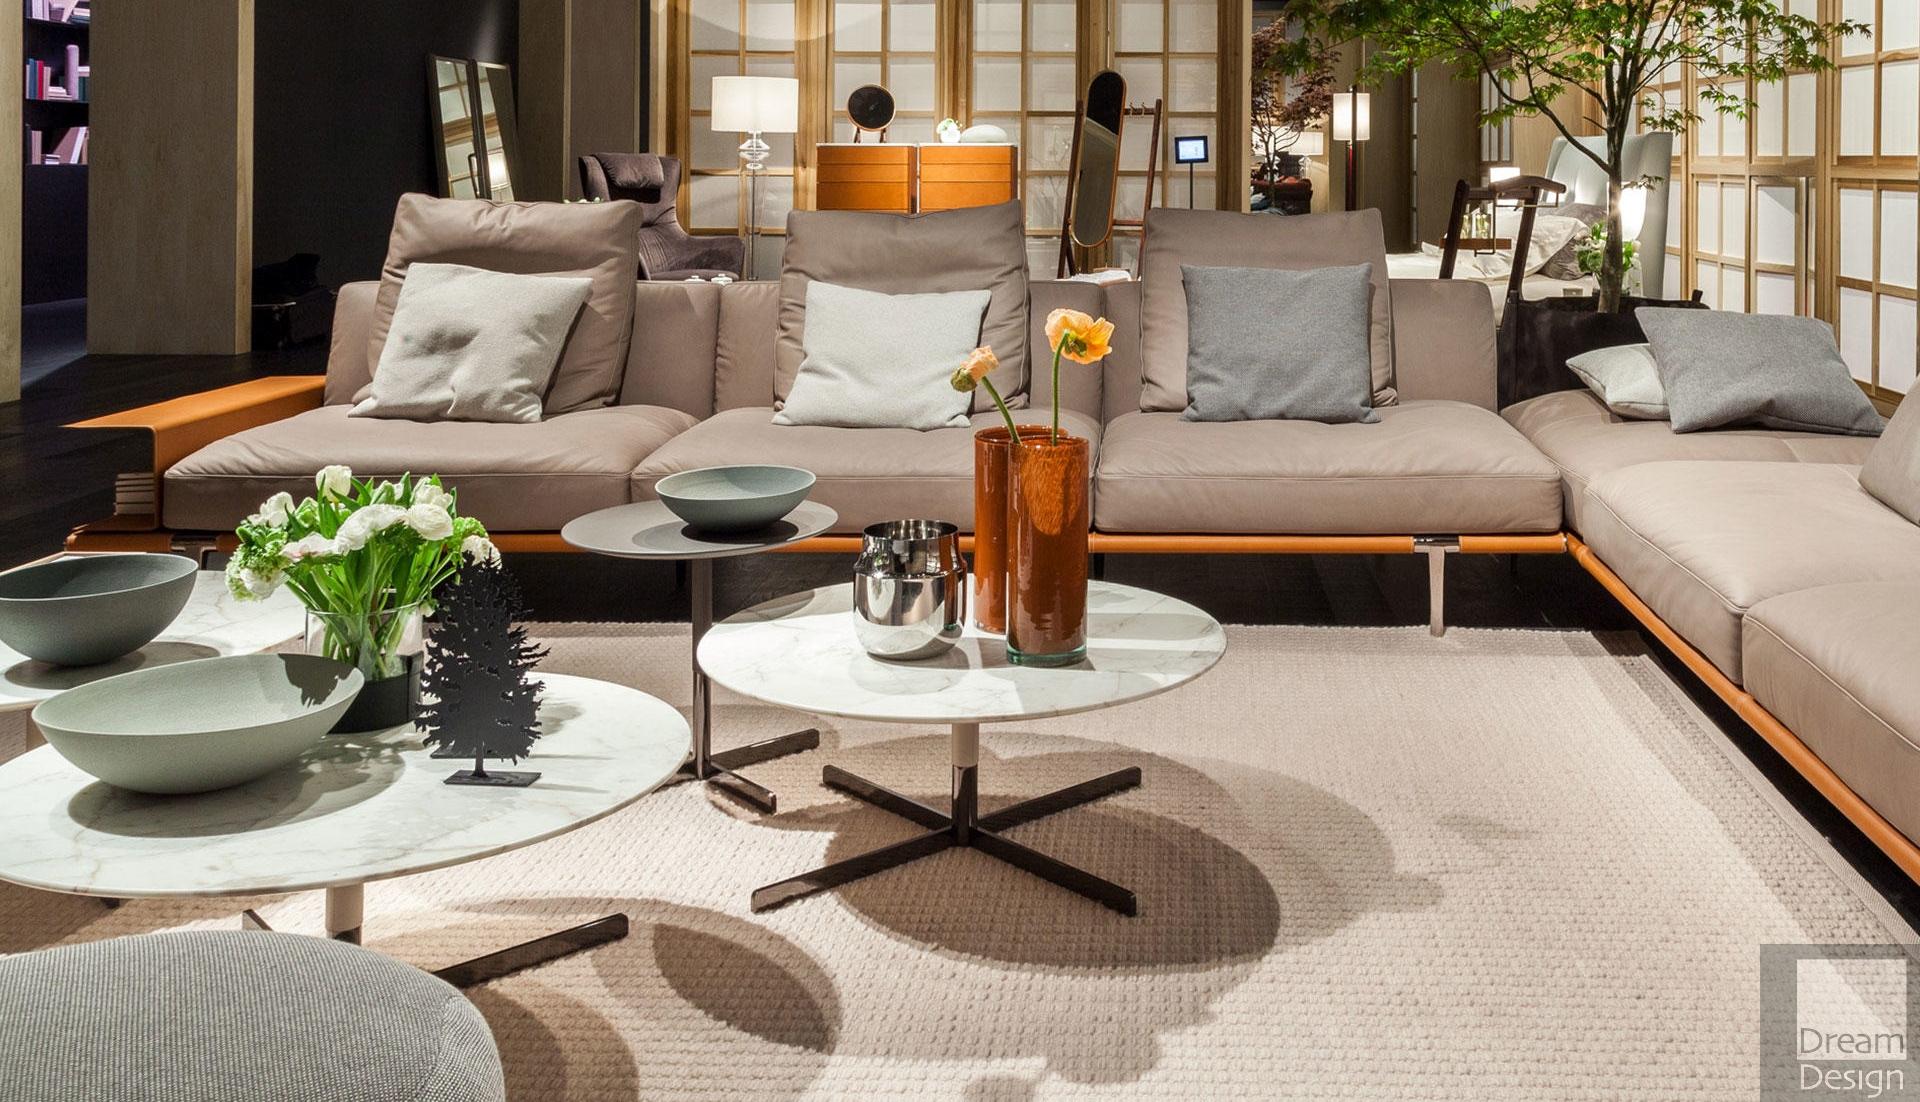 Poltrona Frau Bob Coffee Table Dream Design Interiors Ltd